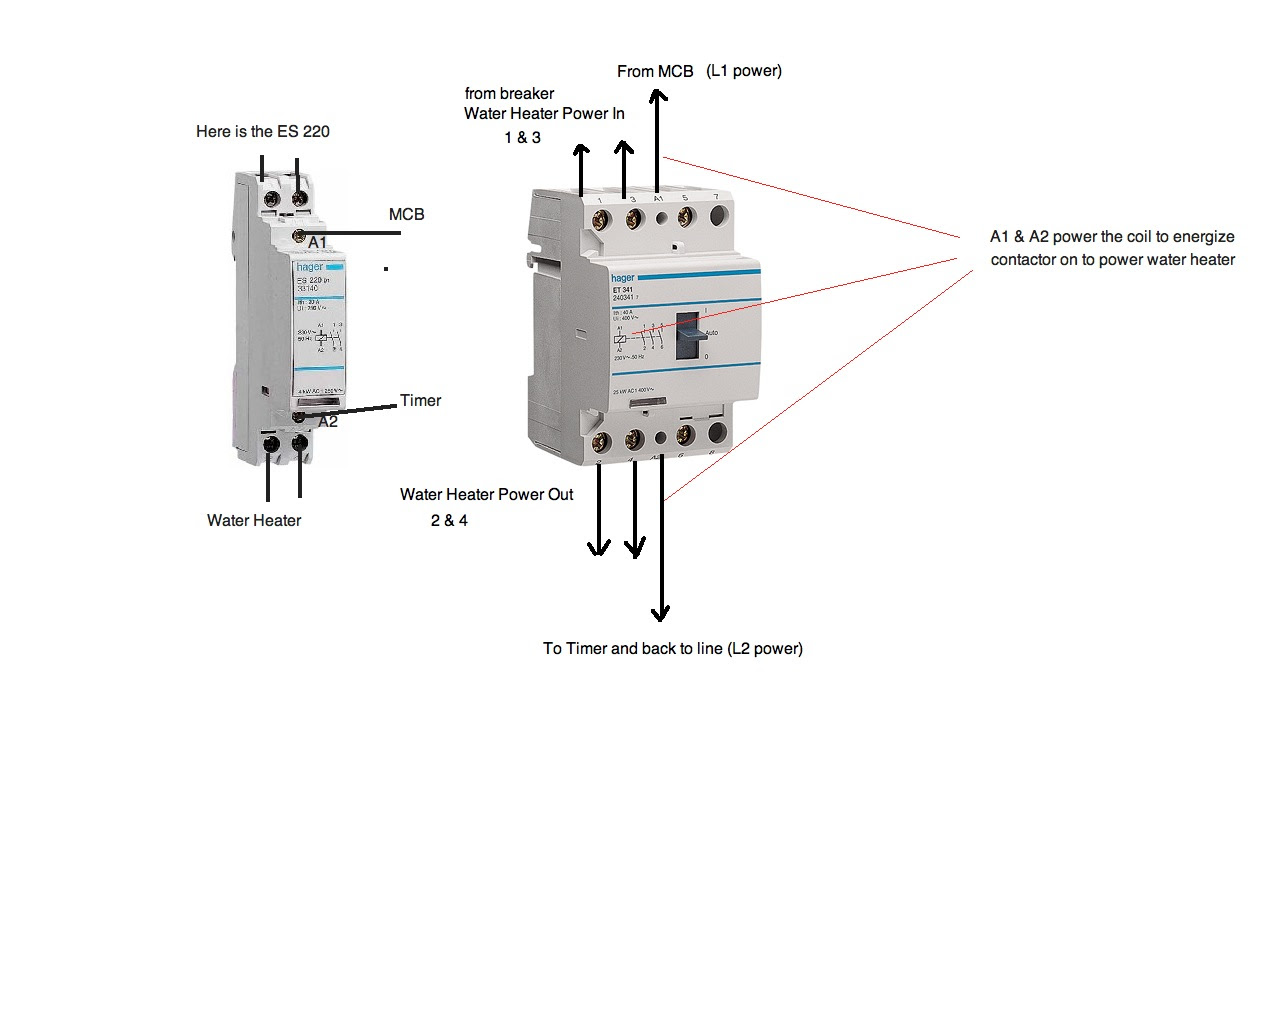 Download Diagram Electric Water Heater Timer Wiring Diagram Hd Version Catsdeals Kinggo Fr